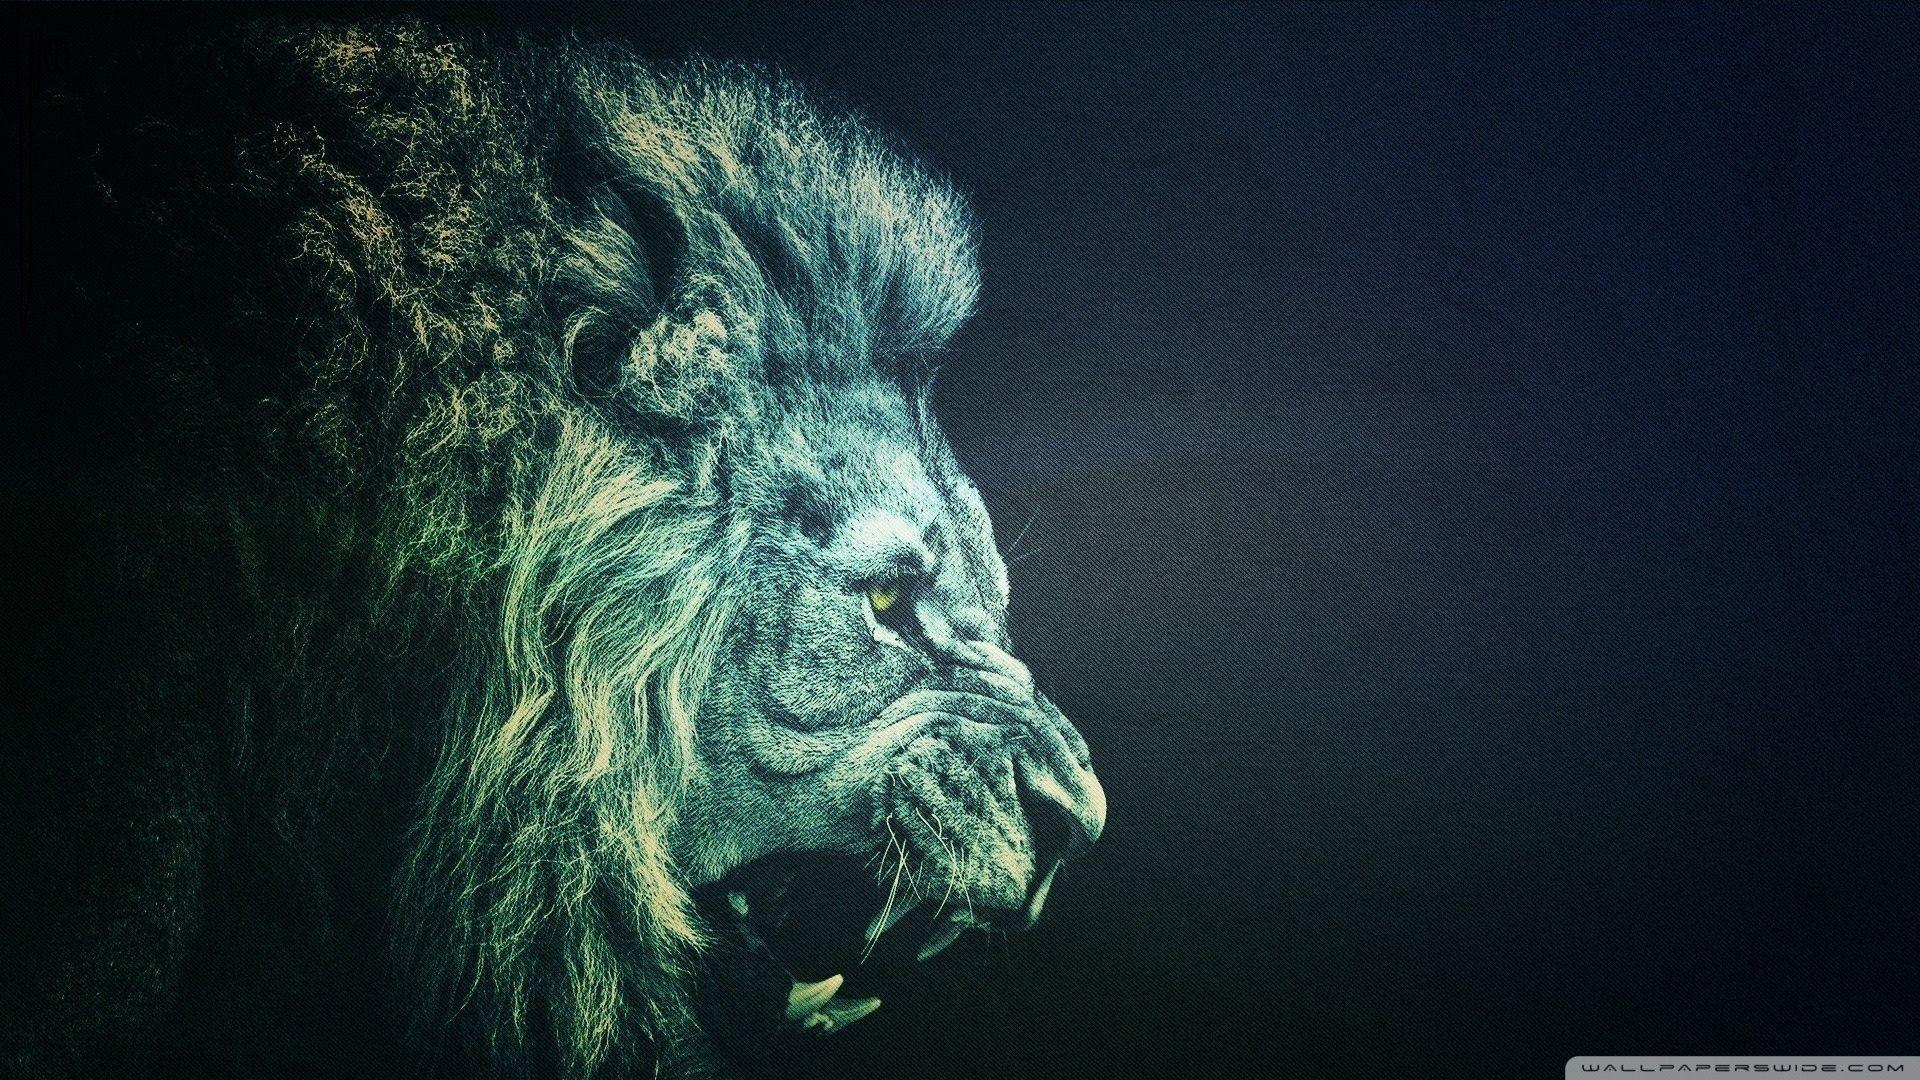 Res: 1920x1080, Image for LION Wallpaper Full HD 1080p HJ7